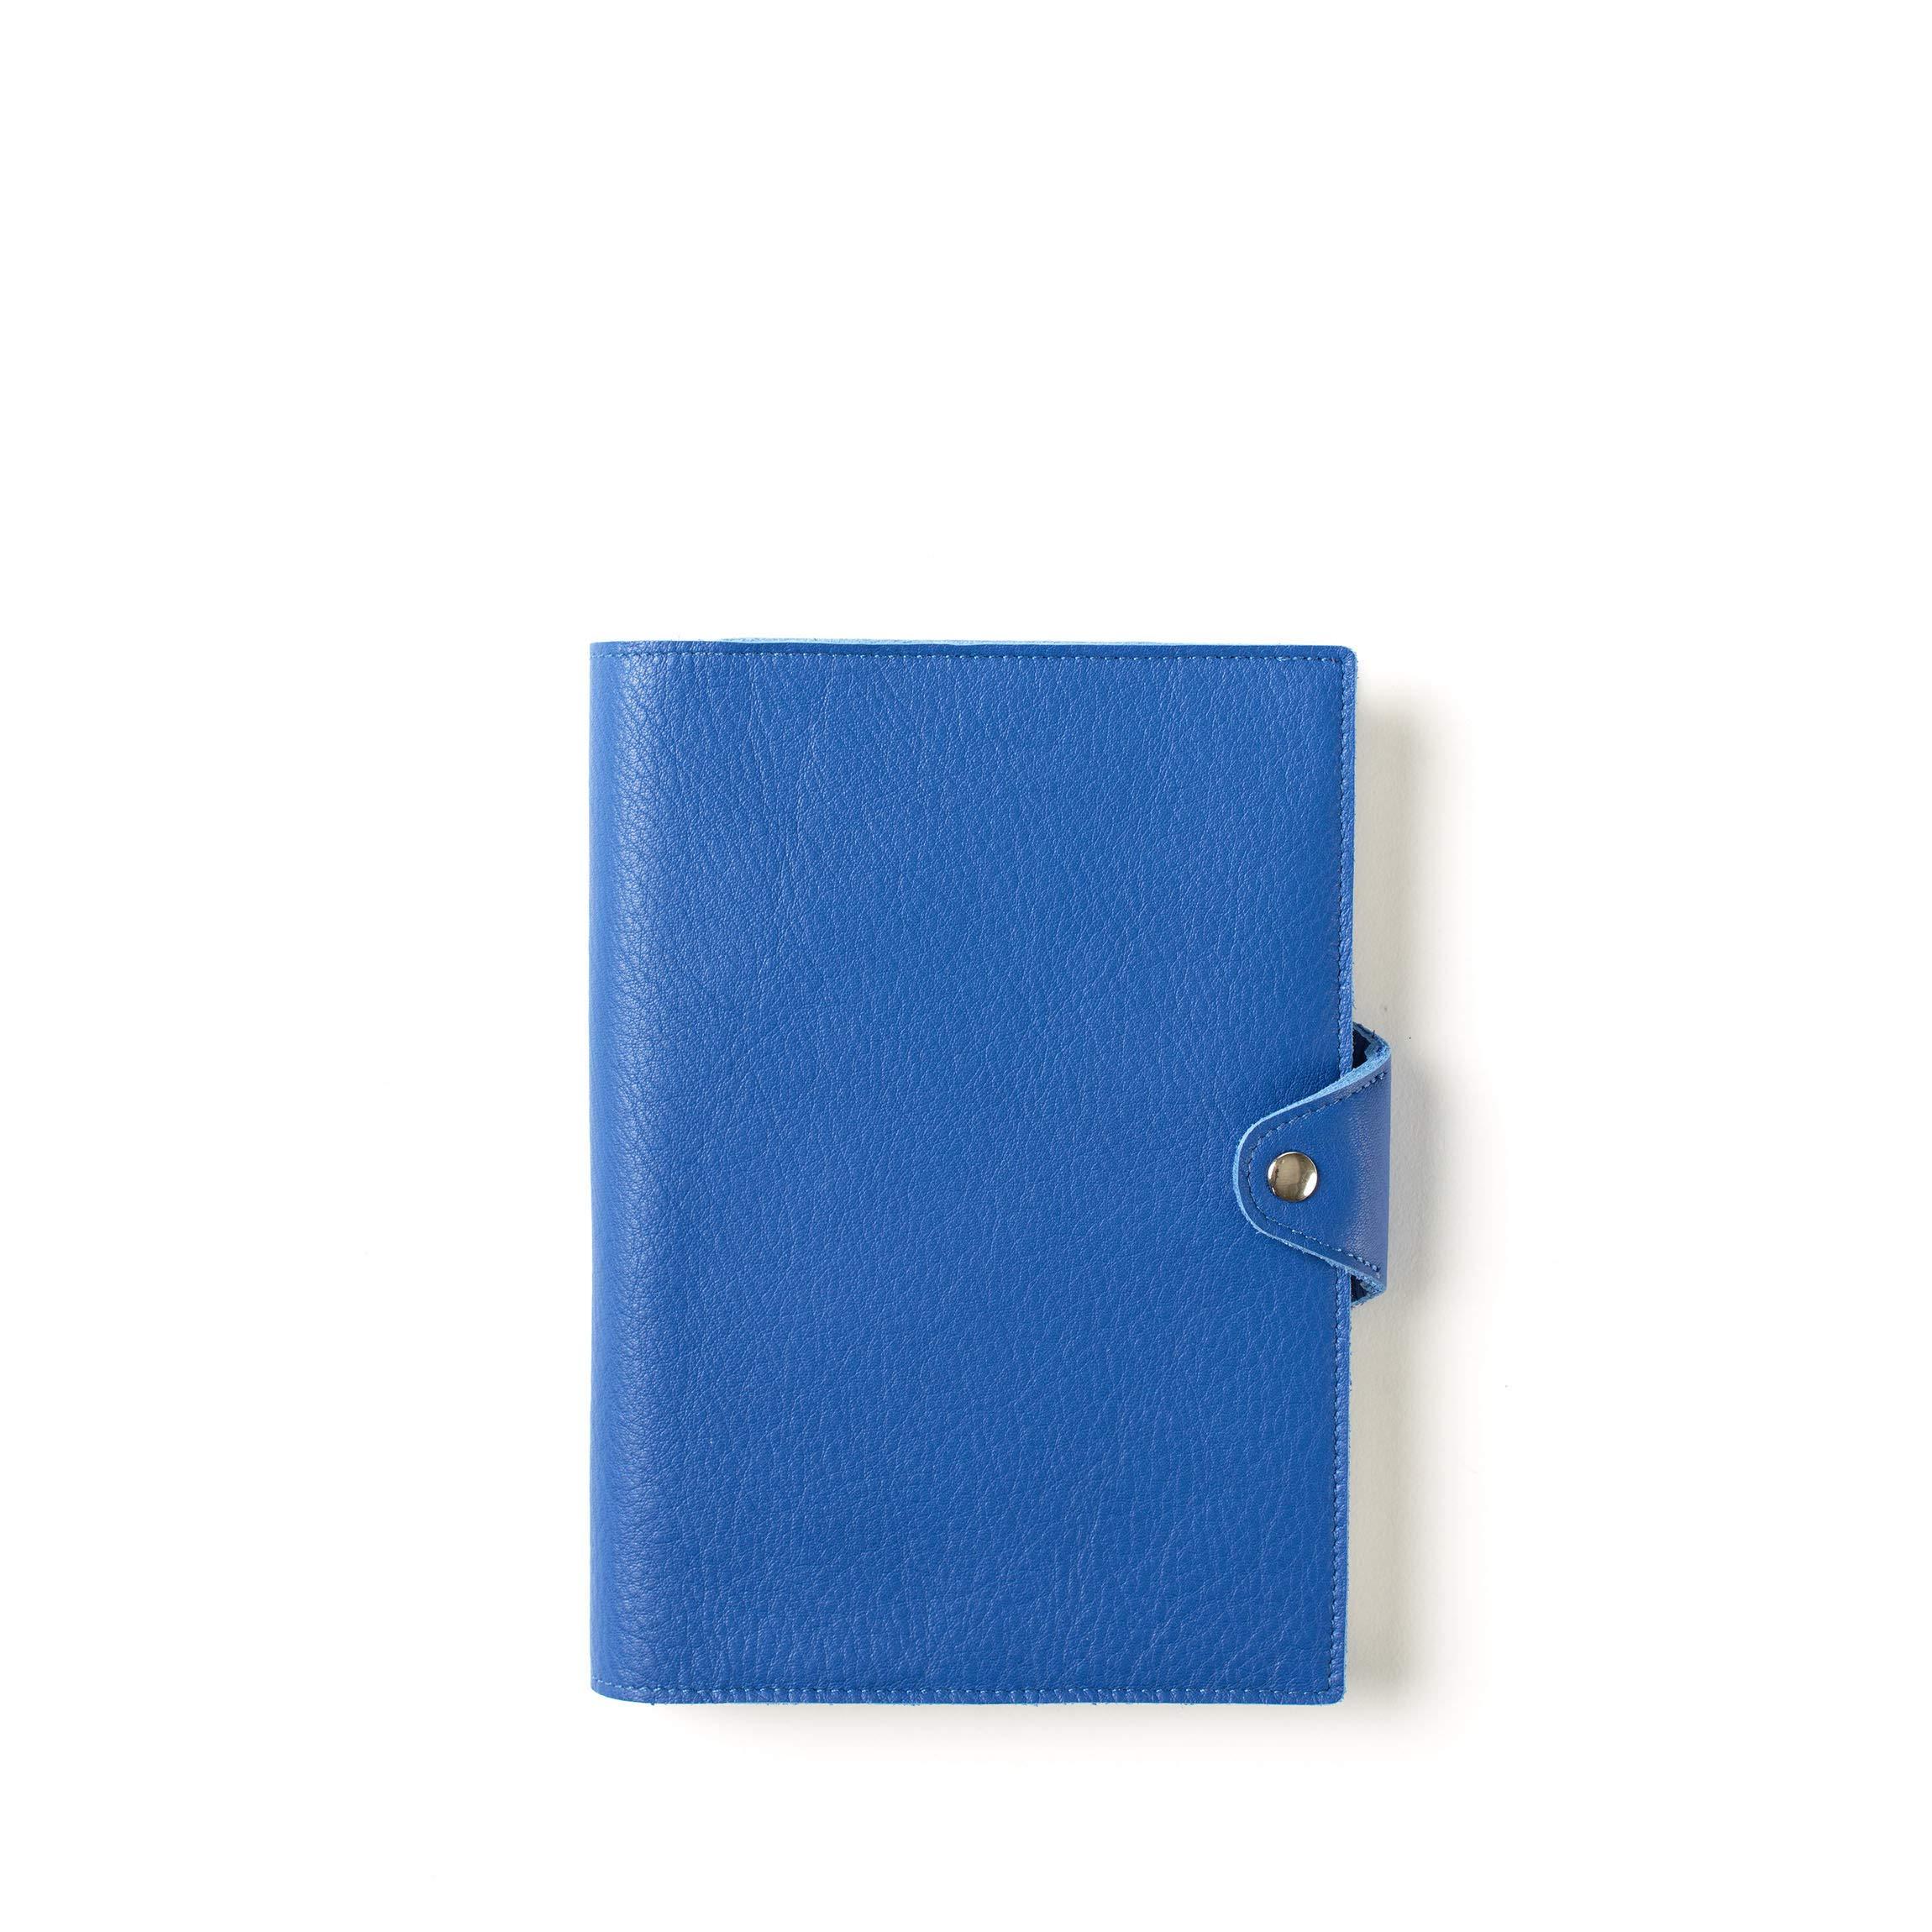 Medium Snap Journal with Pen Loop - Full Grain Leather - Cobalt (blue)